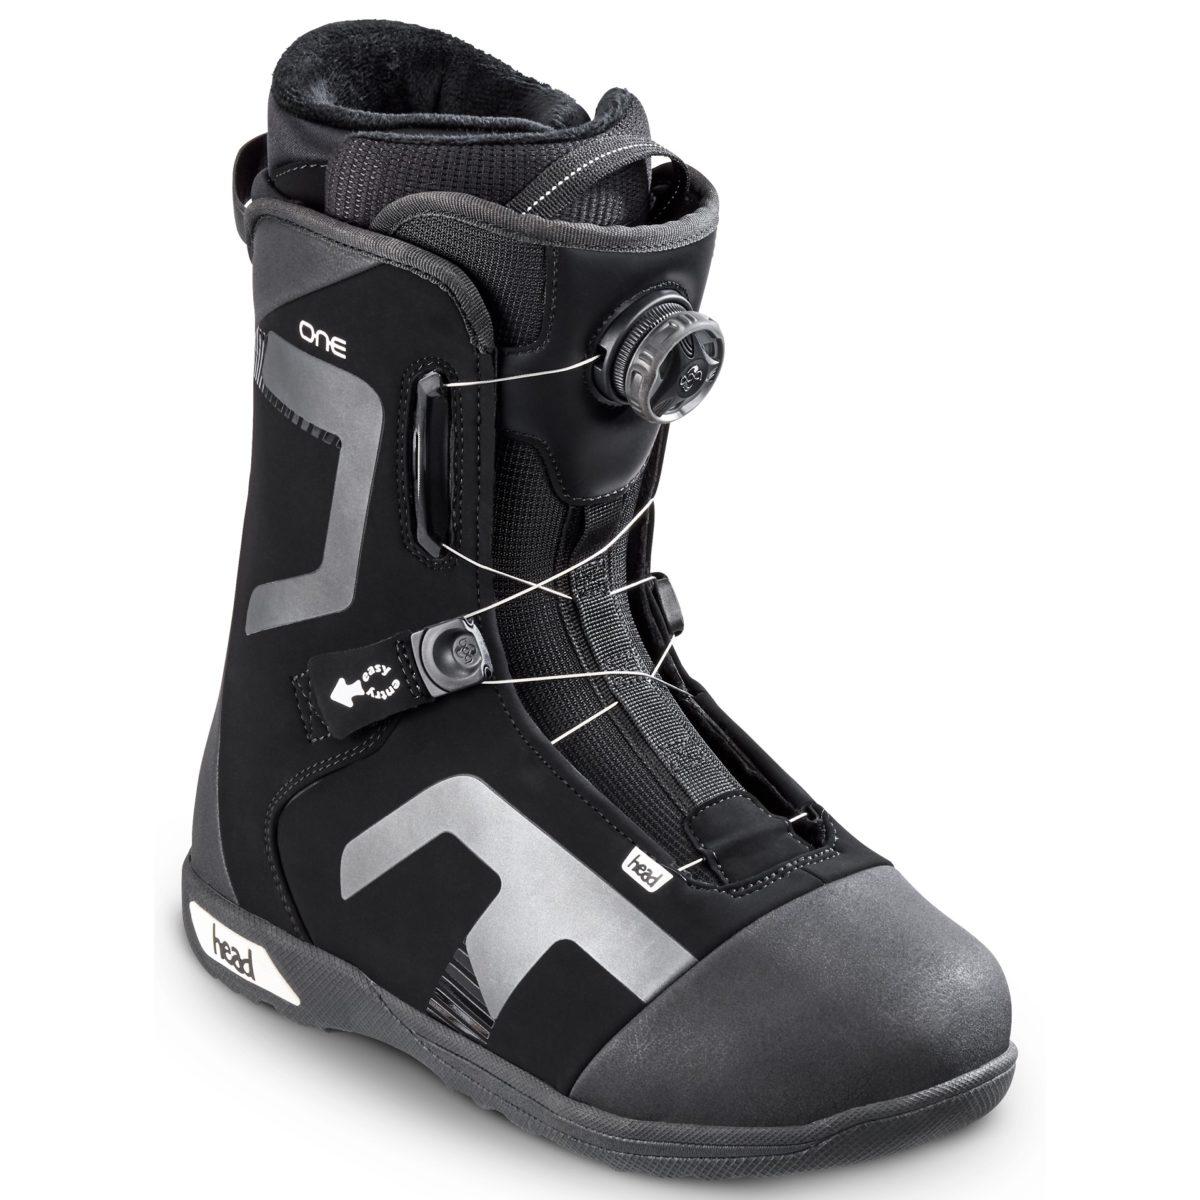 HEAD ONE BOA Ботинки для сноуборда  350508 - 1